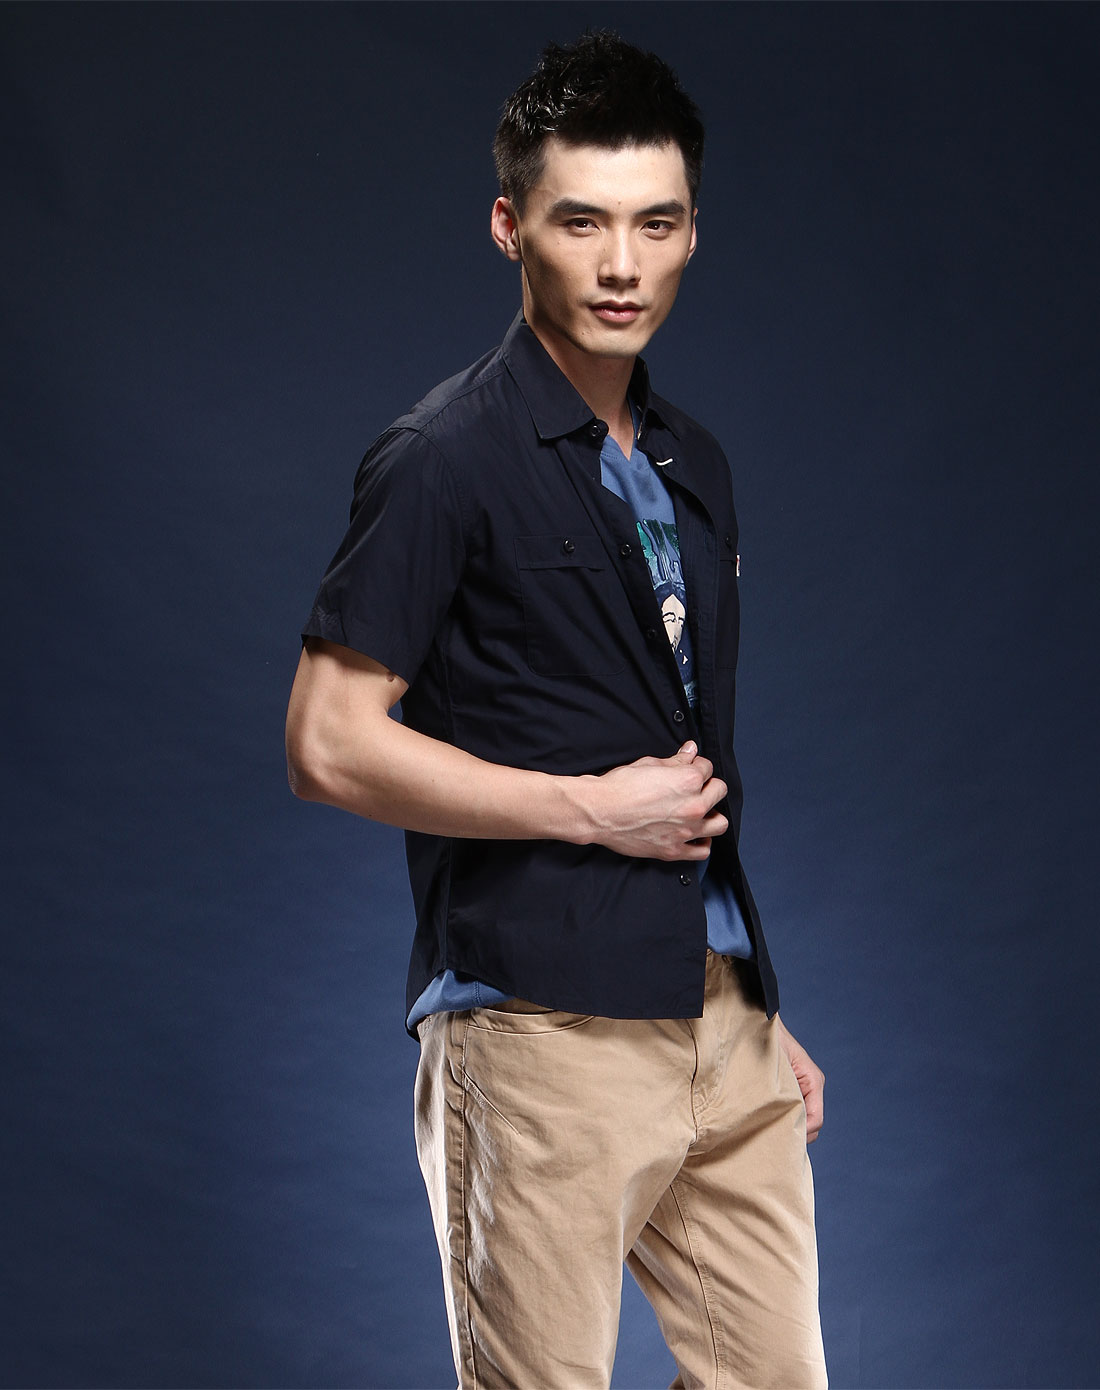 american宝蓝色简约短袖衬衫